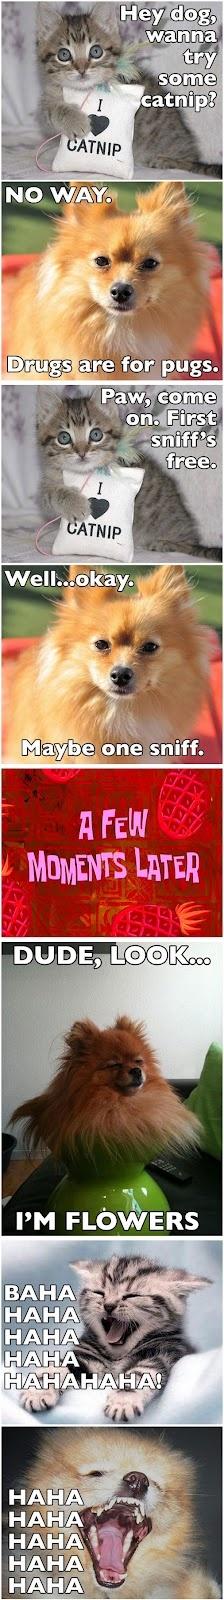 Dog Tries Catnip | Funny Memes